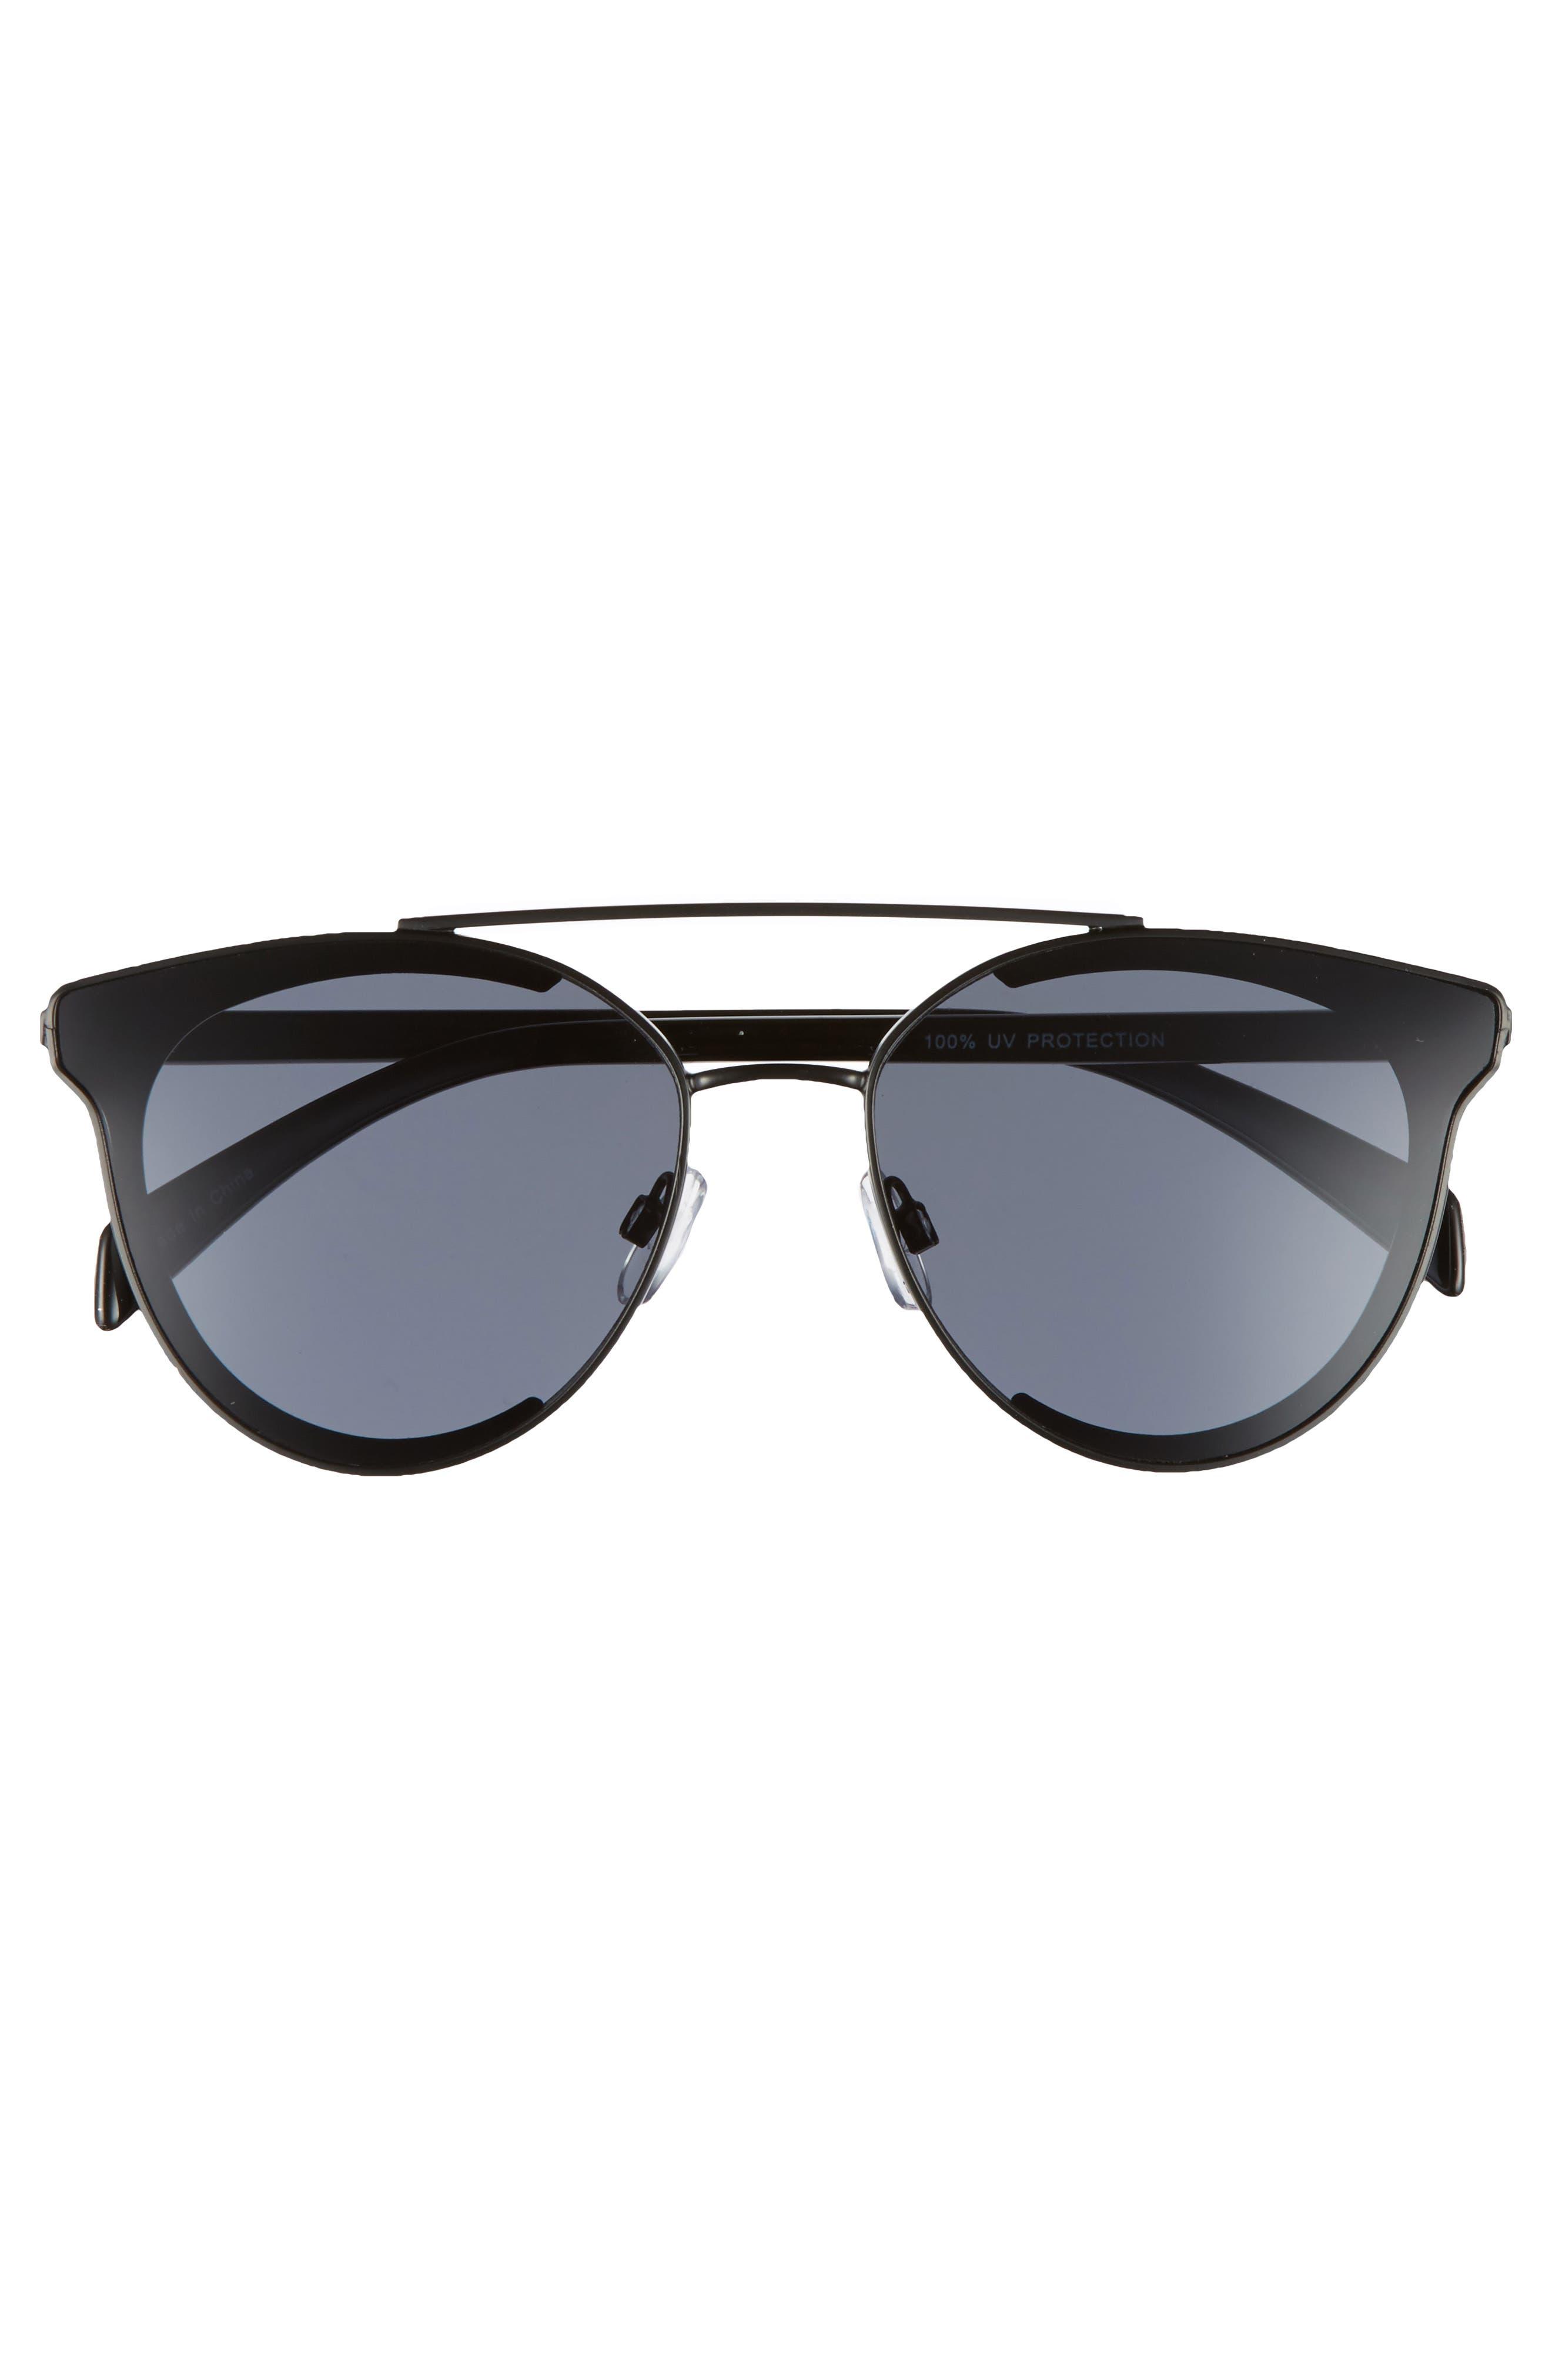 58mm Aviator Sunglasses,                             Alternate thumbnail 3, color,                             001